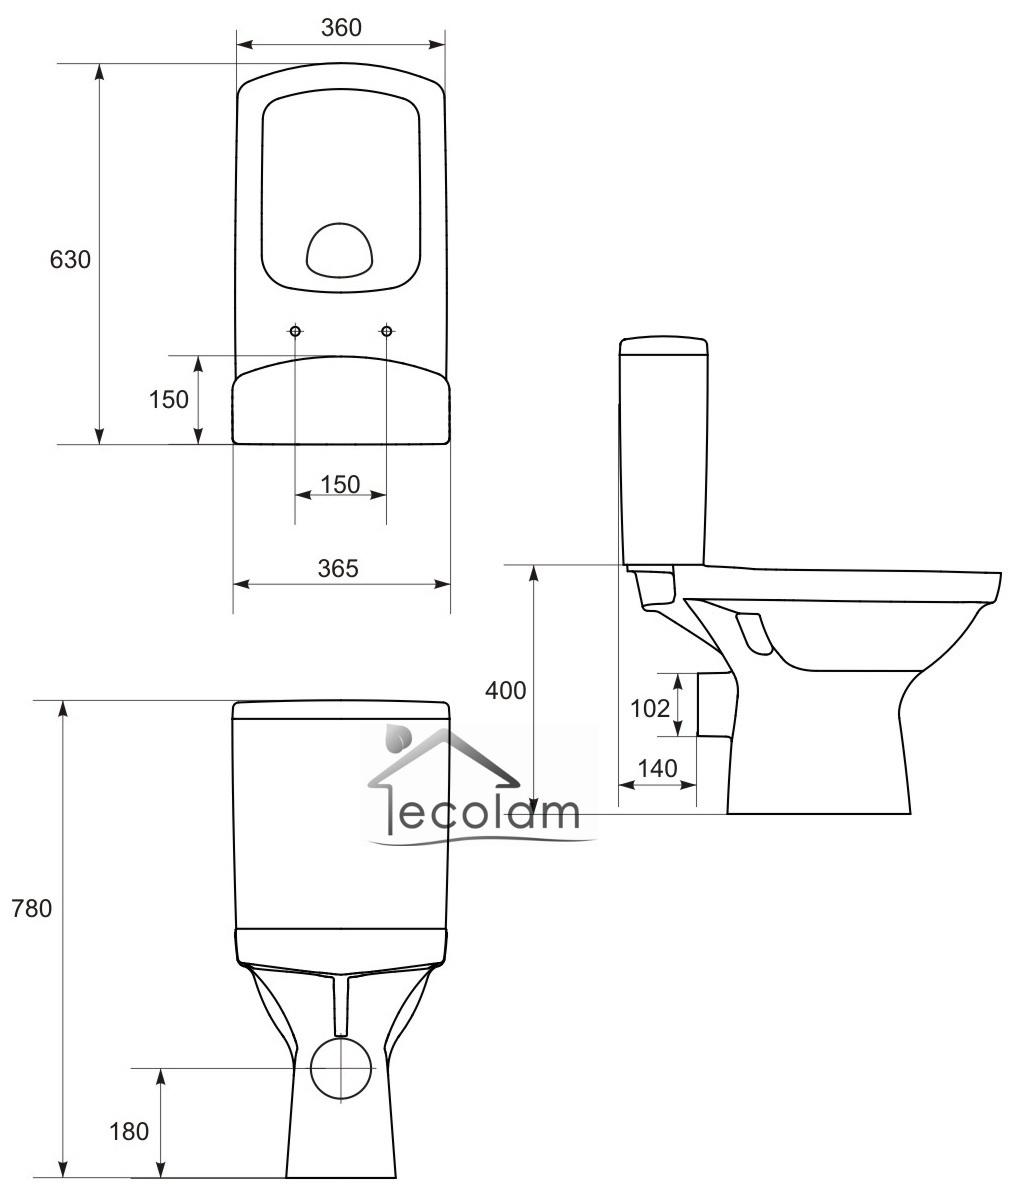 wc toilette stand tiefsp ler sp lkasten clean pro keramik beschichtet sitz 5902574408129 ebay. Black Bedroom Furniture Sets. Home Design Ideas